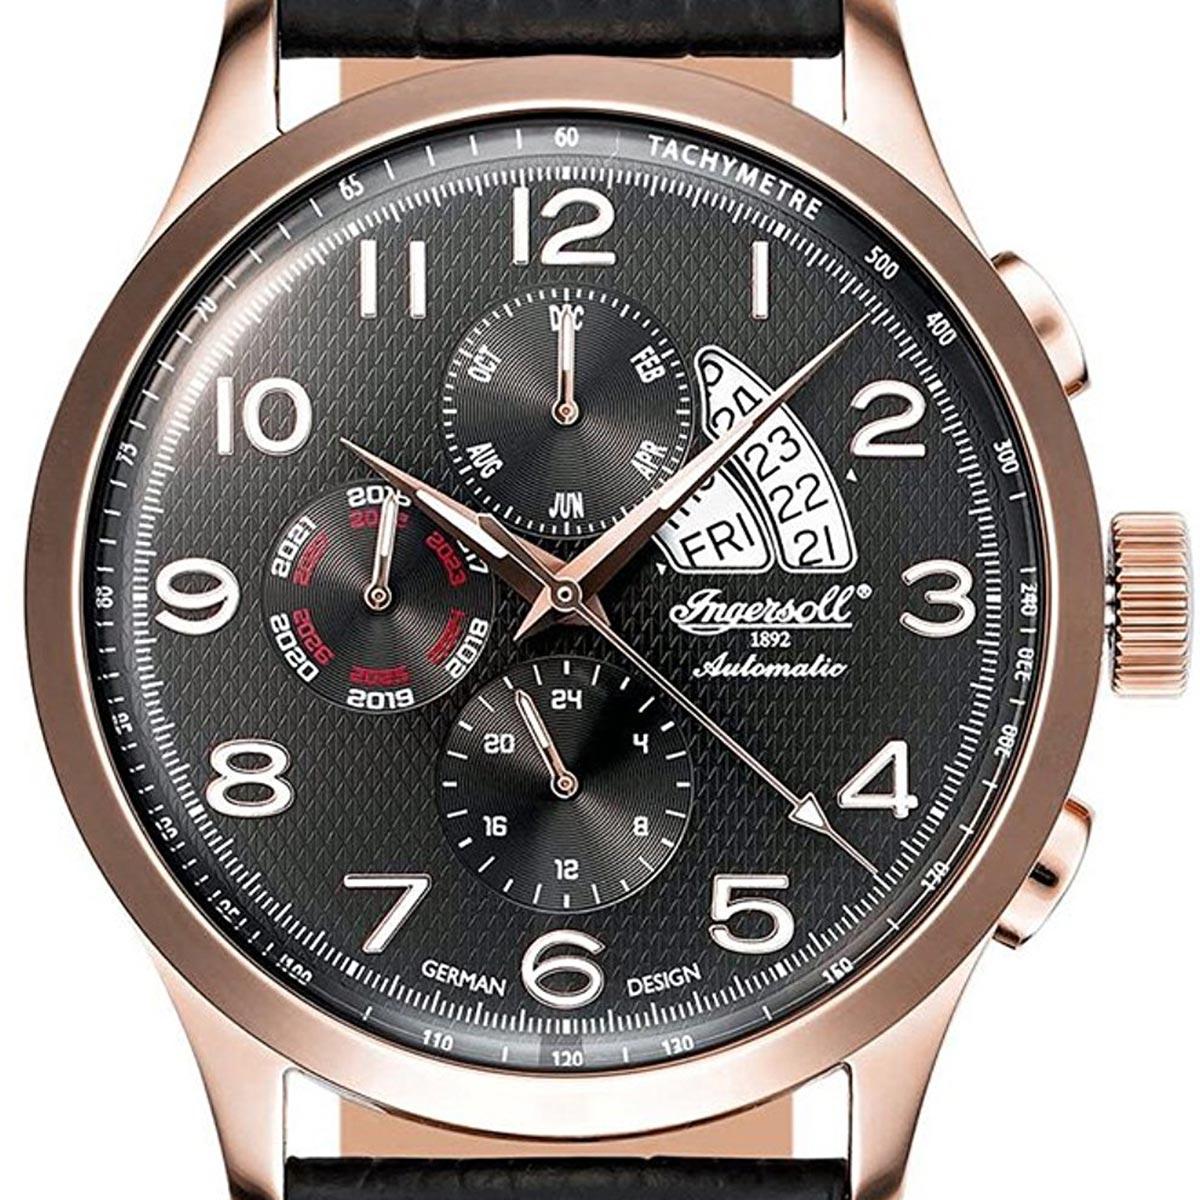 Ingeresoll インガーソル/インガソール 自動巻き 腕時計 [IN1514RBK] 並行輸入品 純正ケース メーカー保証24ヶ月